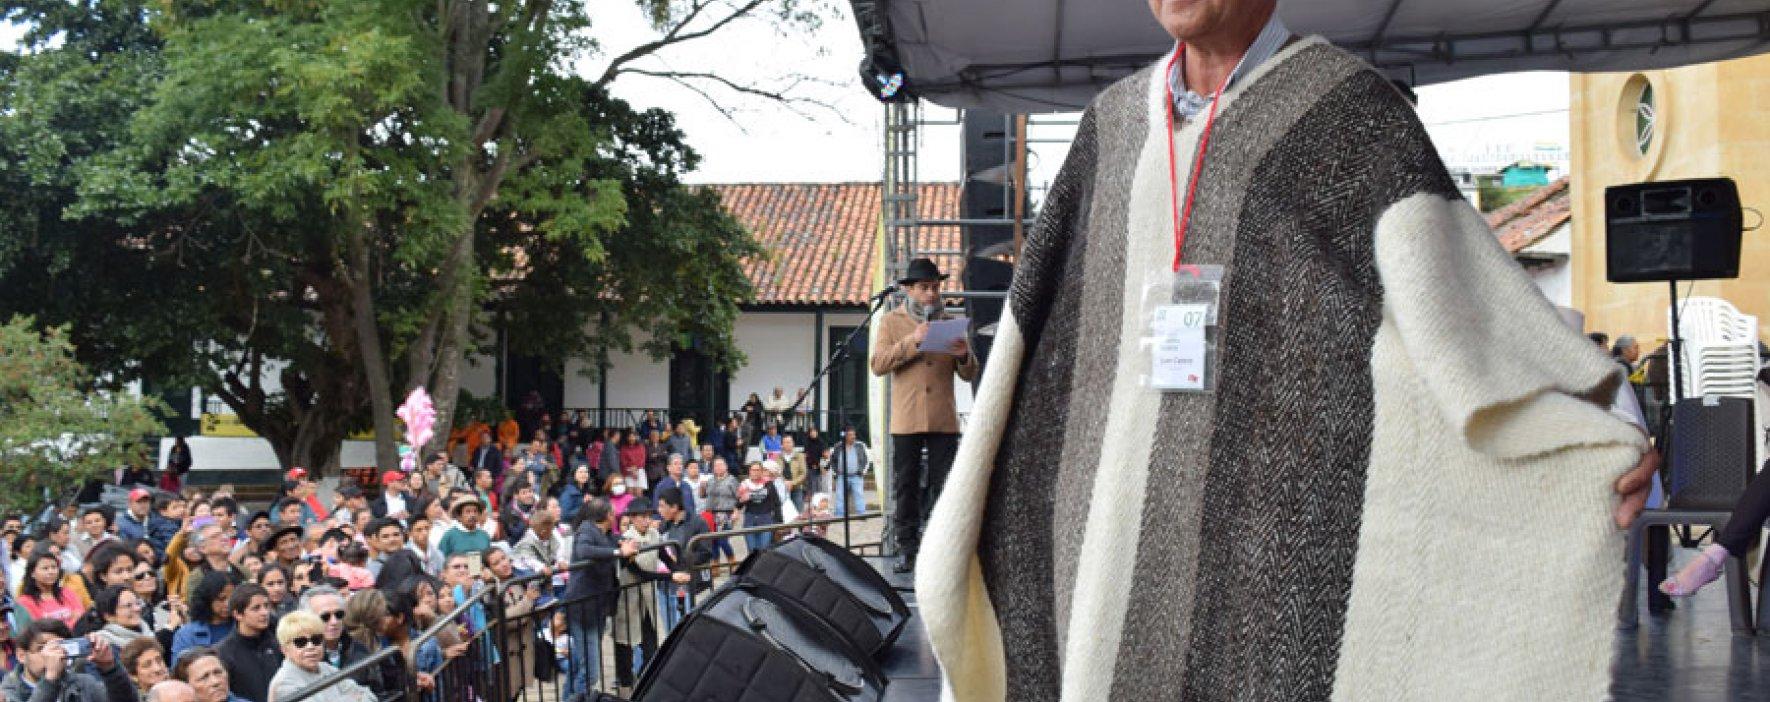 En Festilana 2016, Cucunubá se vistió de fiesta